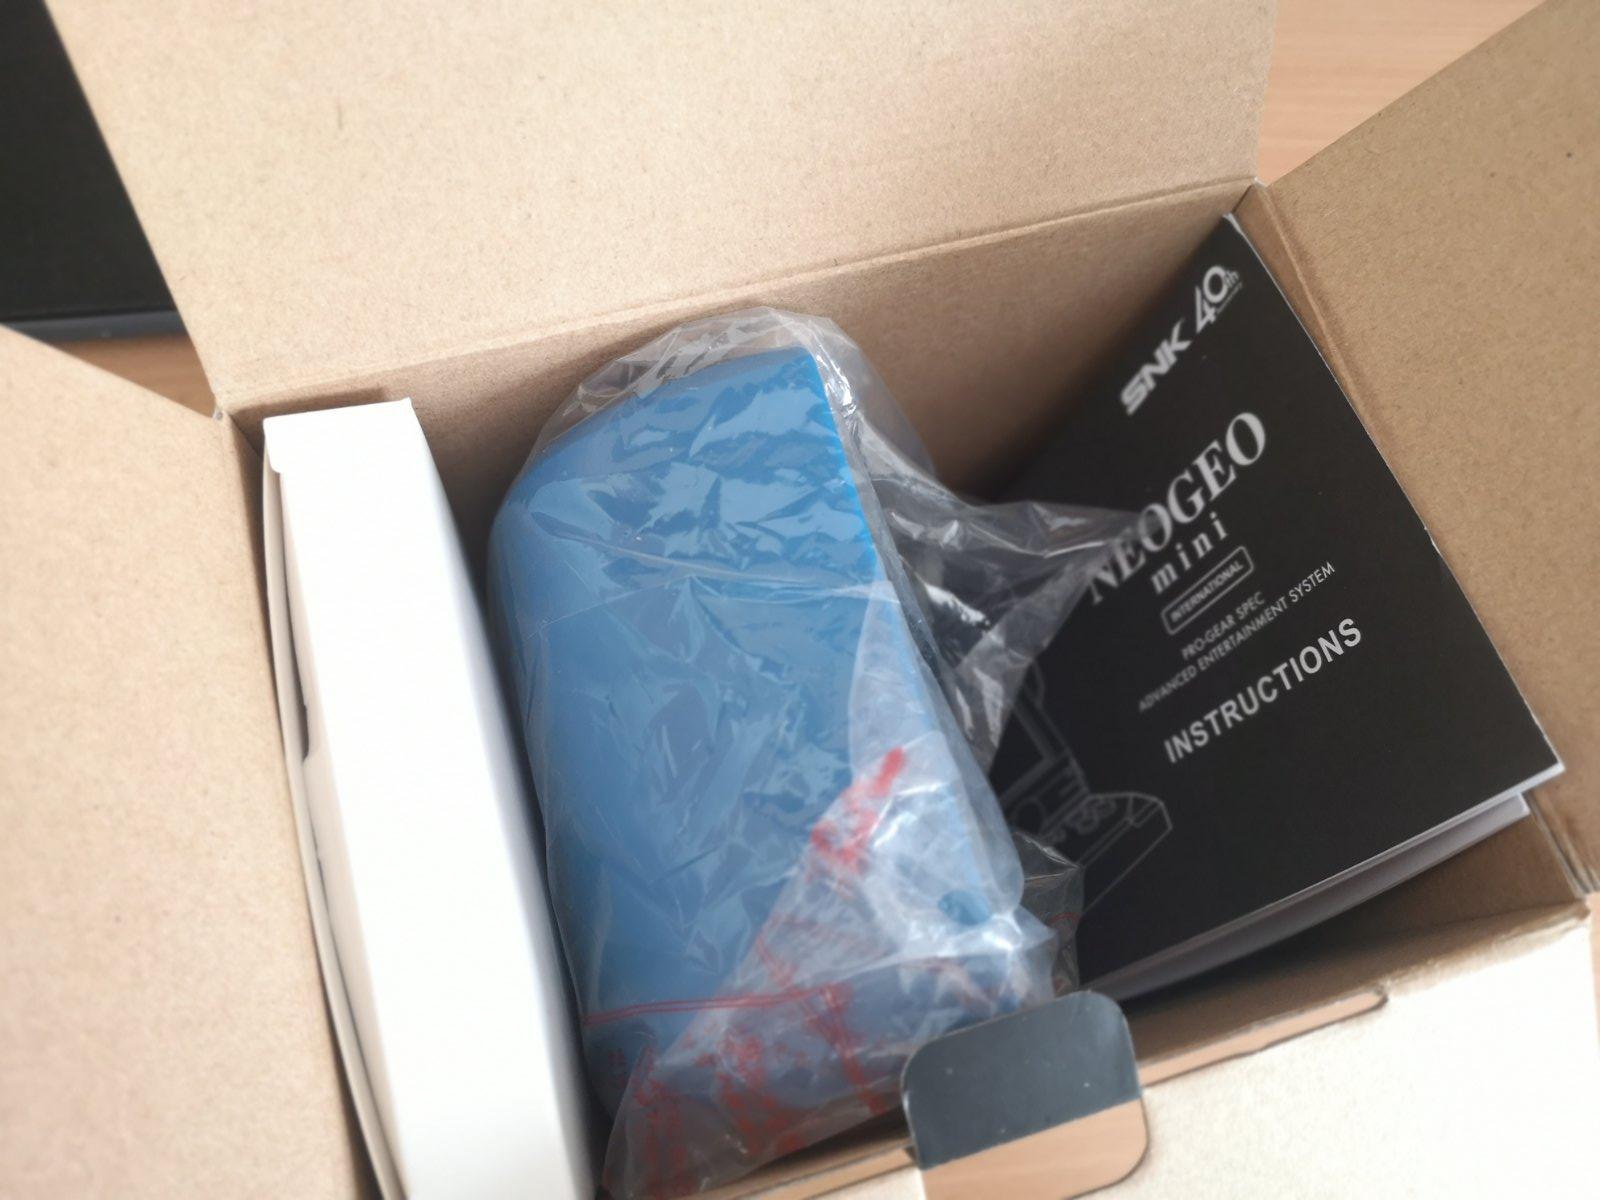 Neo Geo Mini doboz kidobva